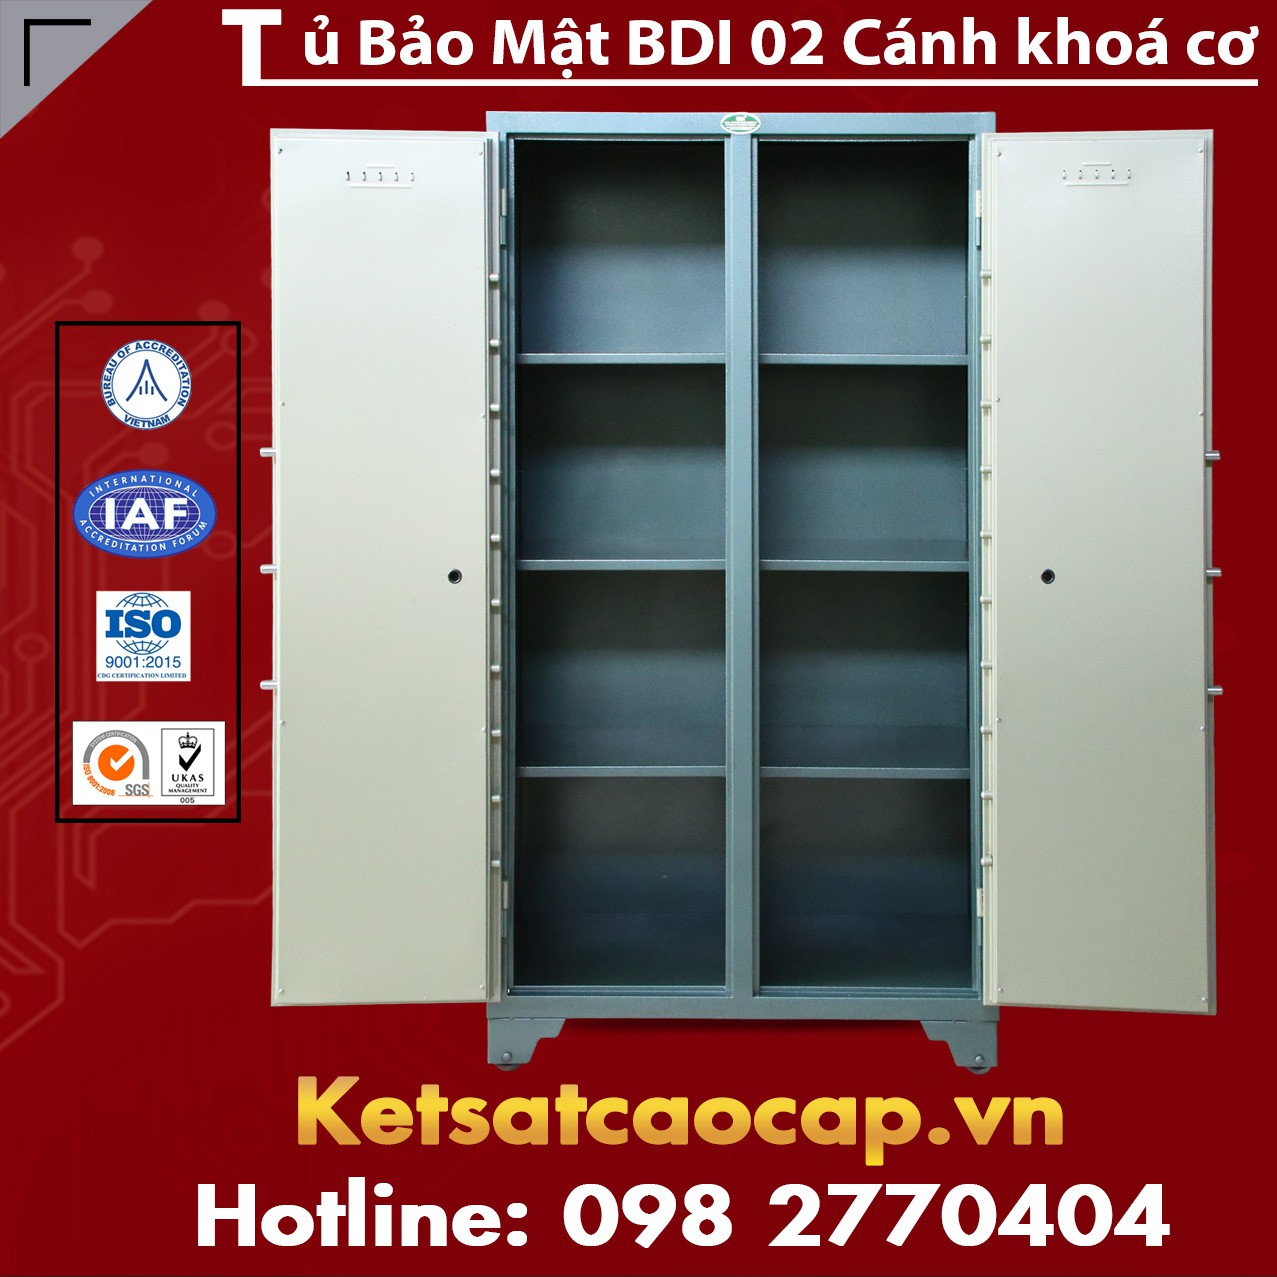 Tu Bao Mat 2 Canh Khoa Co Thong Minh